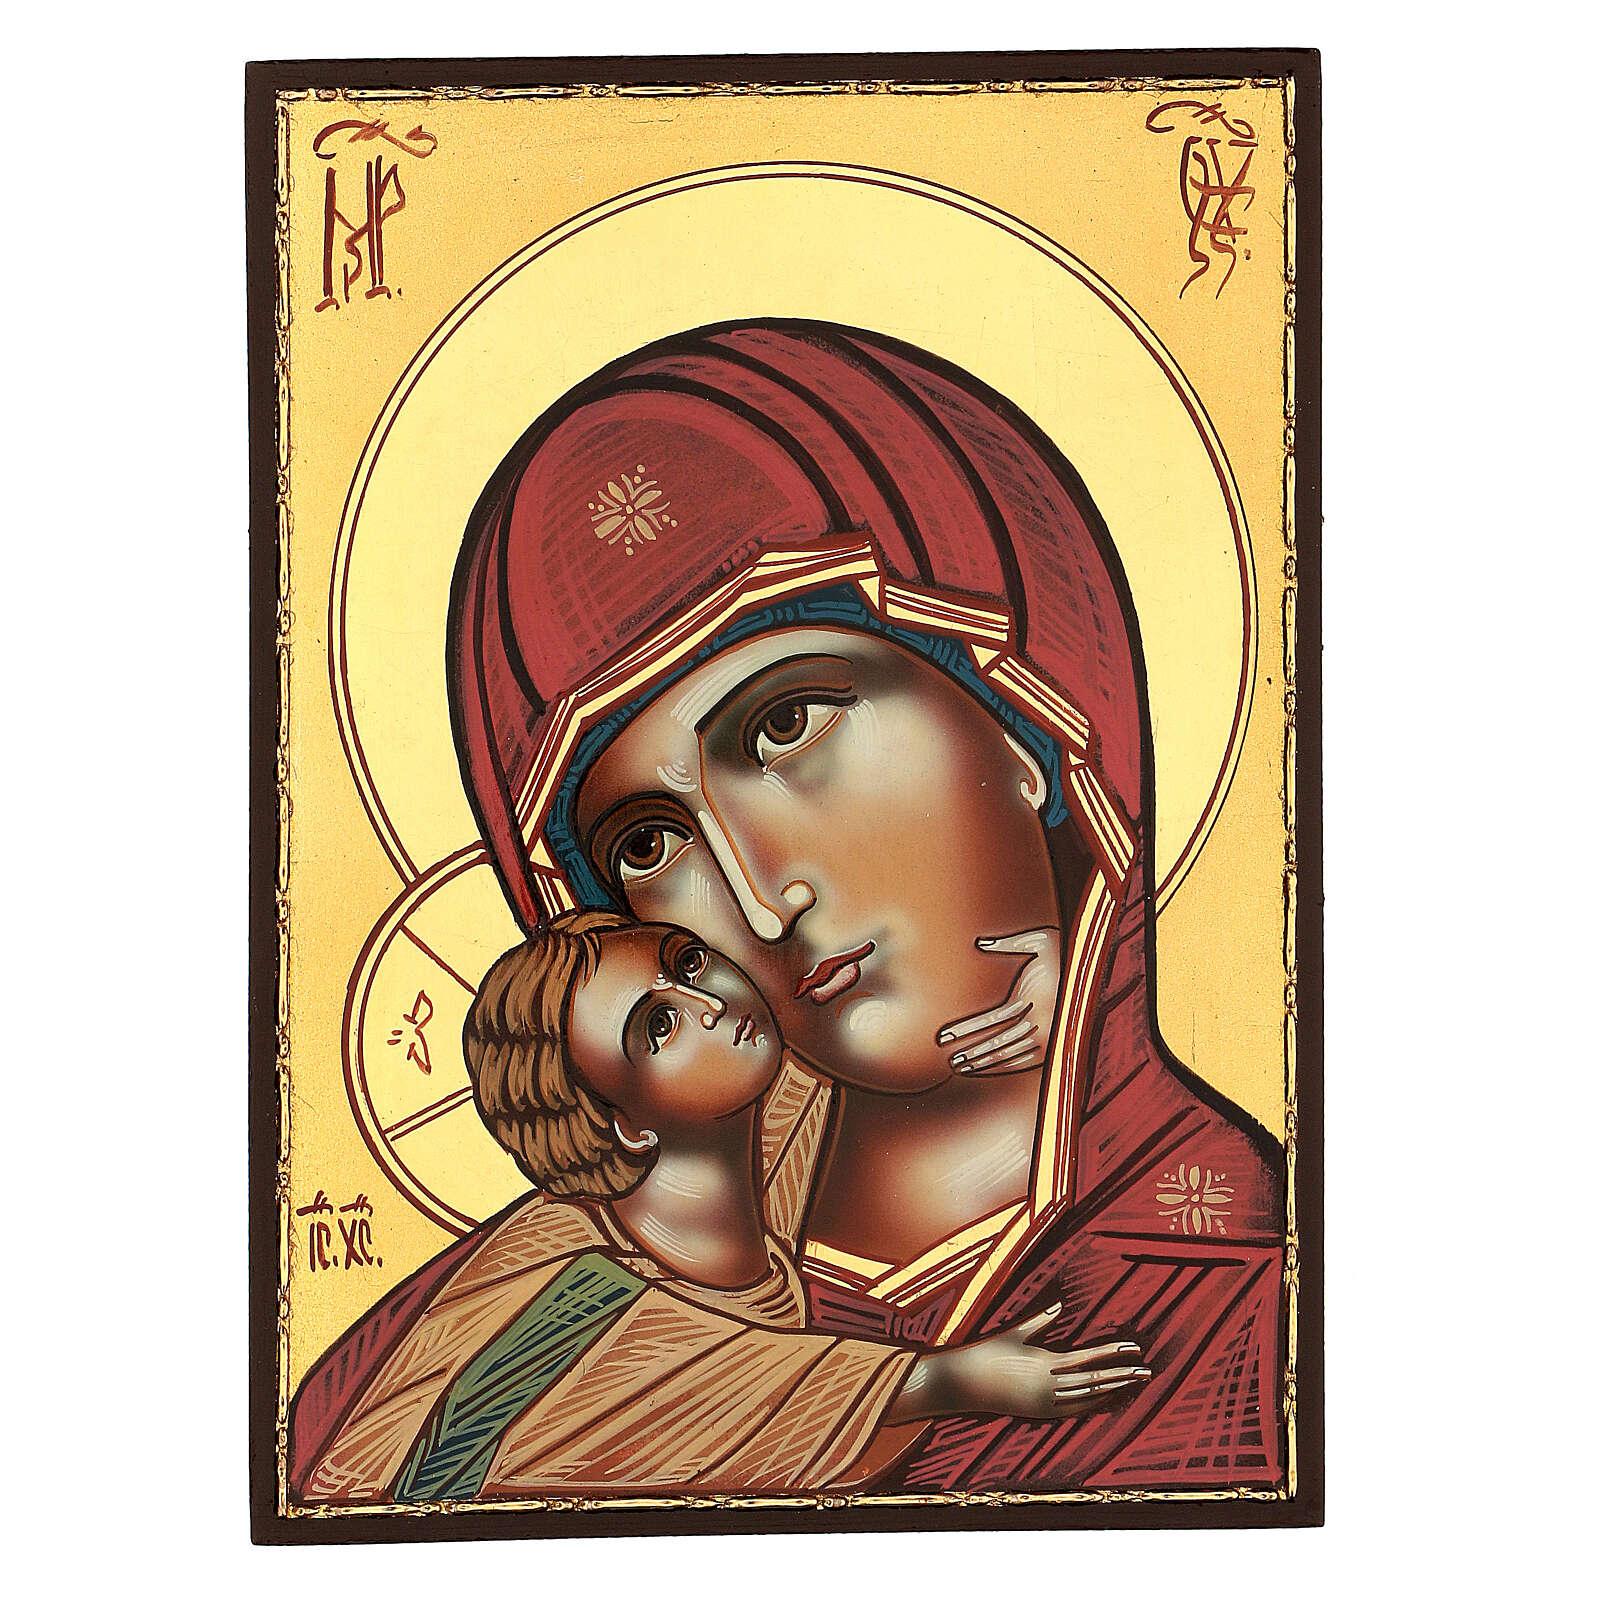 Icona Madonna Tenerezza Vladimirskaja 30x25 cm rumena dipinta 4